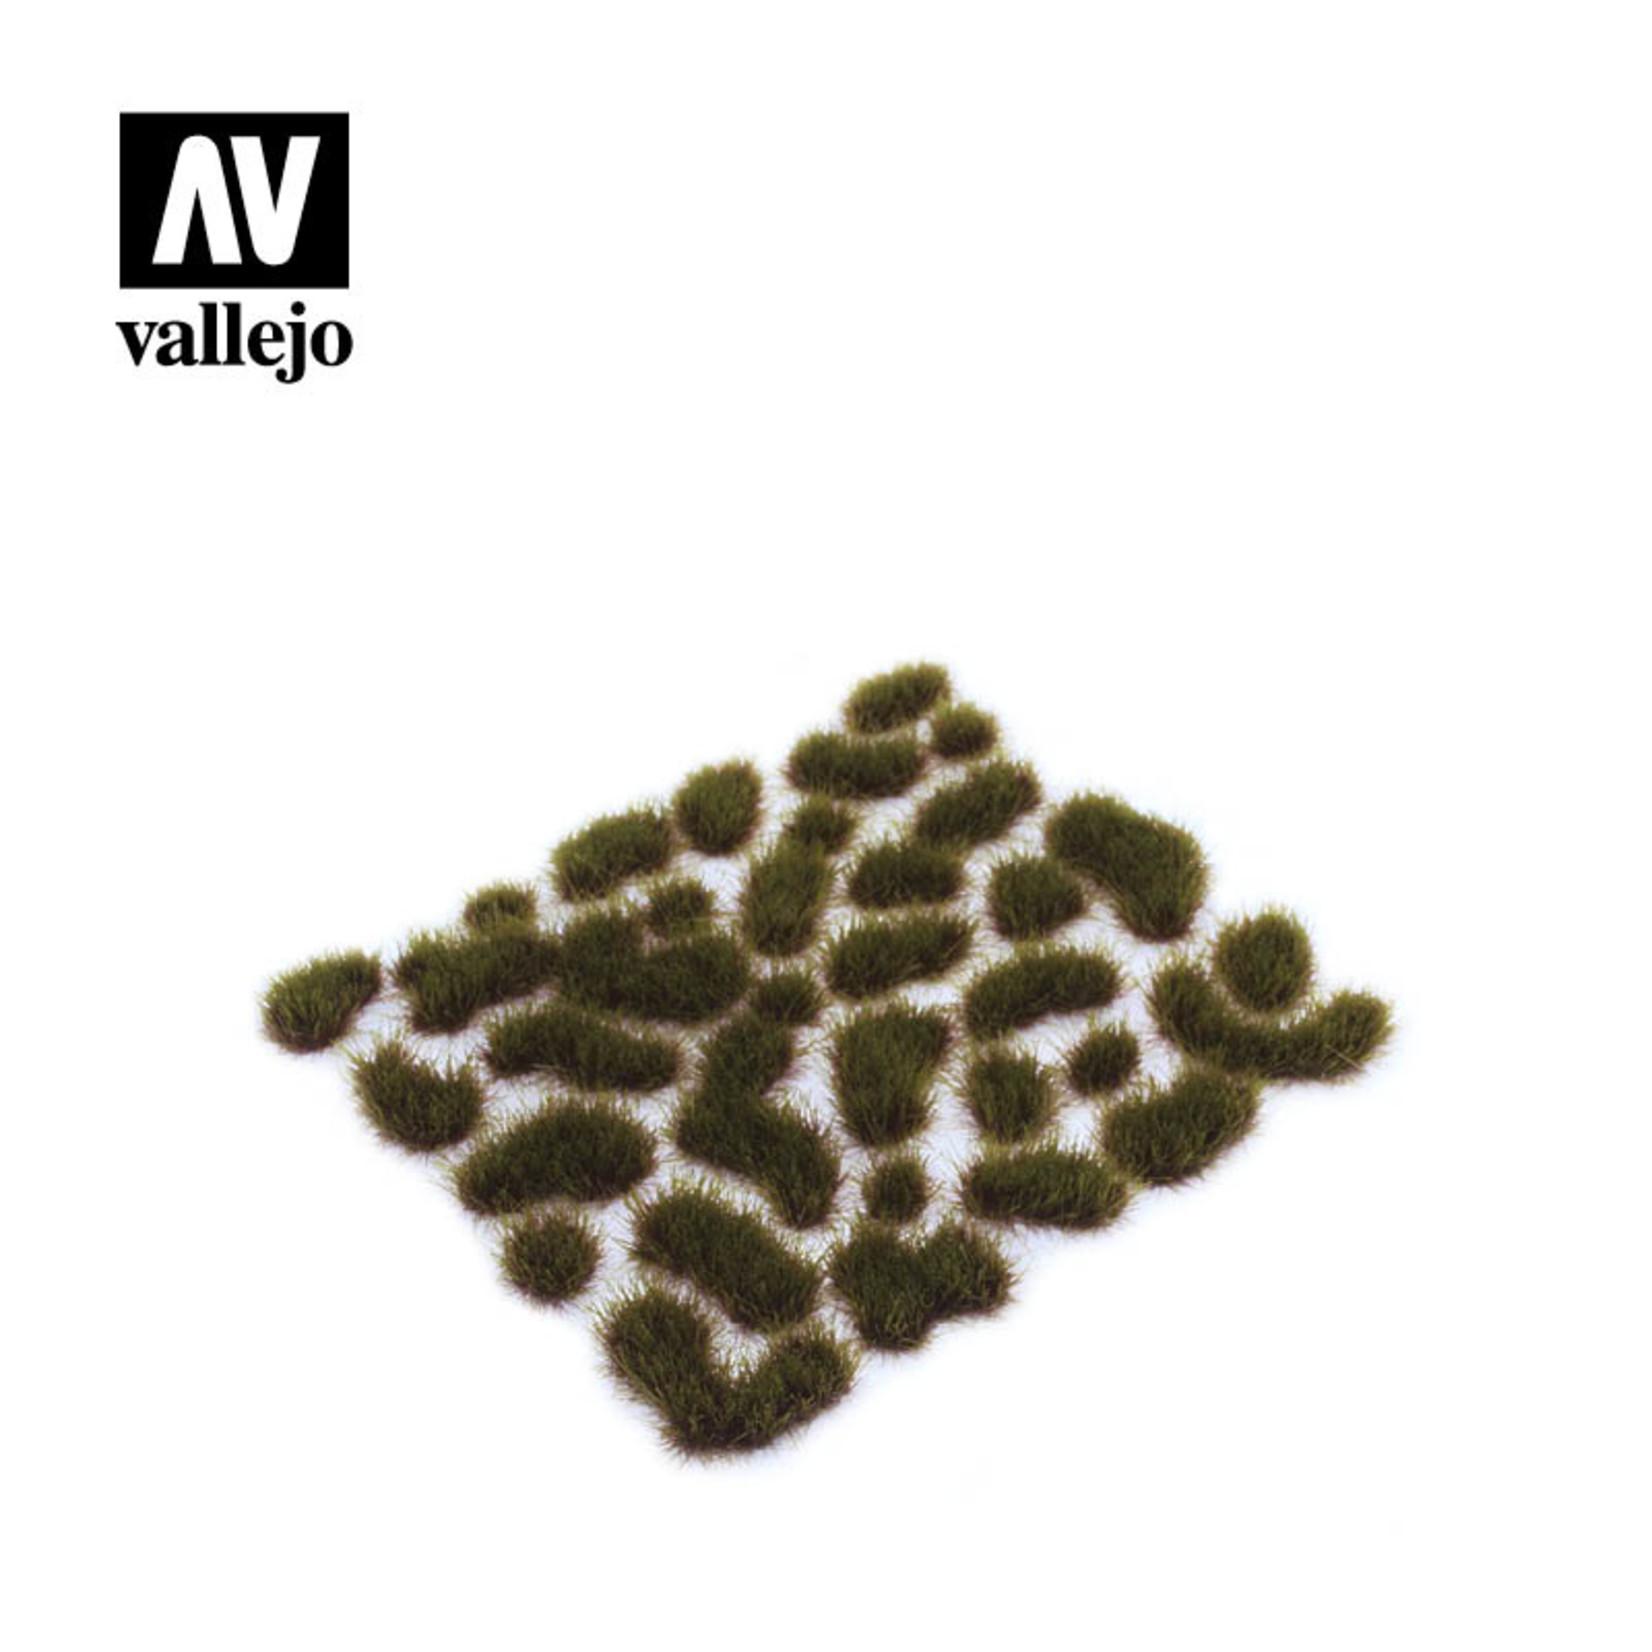 Vallejo Vallejo Scenery: Wild Tuft: Swamp: Medium